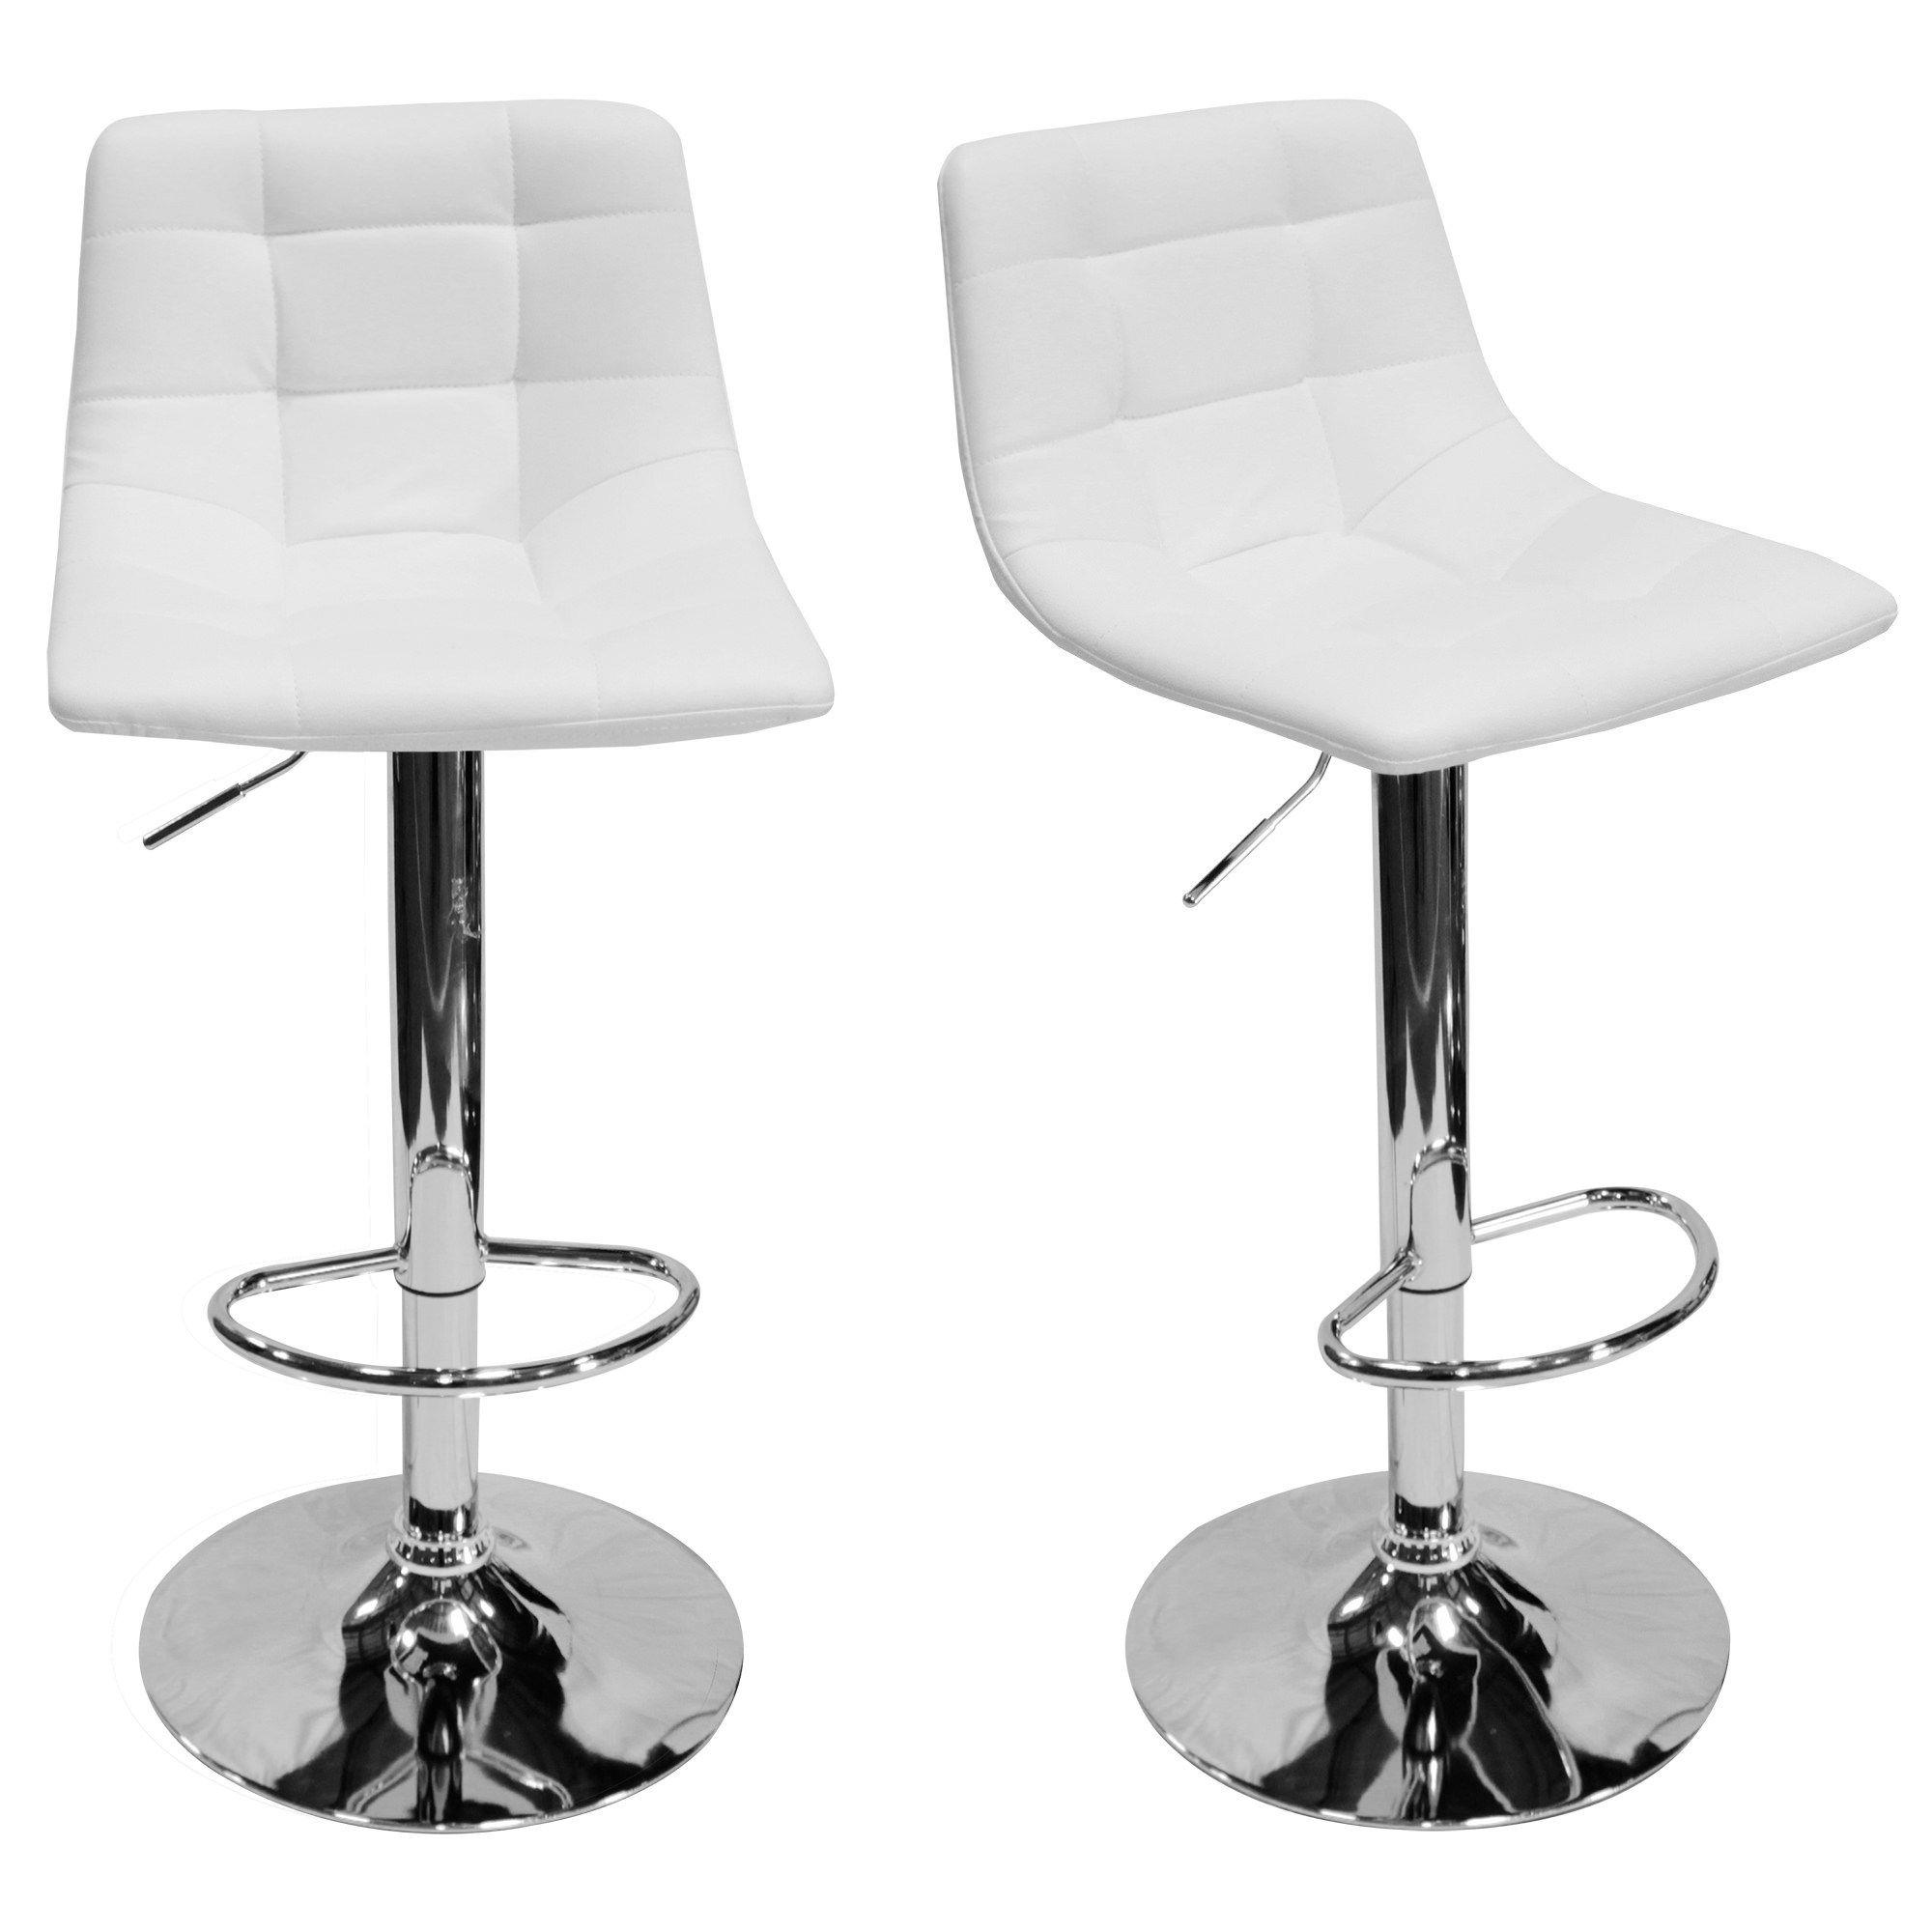 Groovy Best Master Furniture Adjustable Swivel Modern Bar Stools Bralicious Painted Fabric Chair Ideas Braliciousco